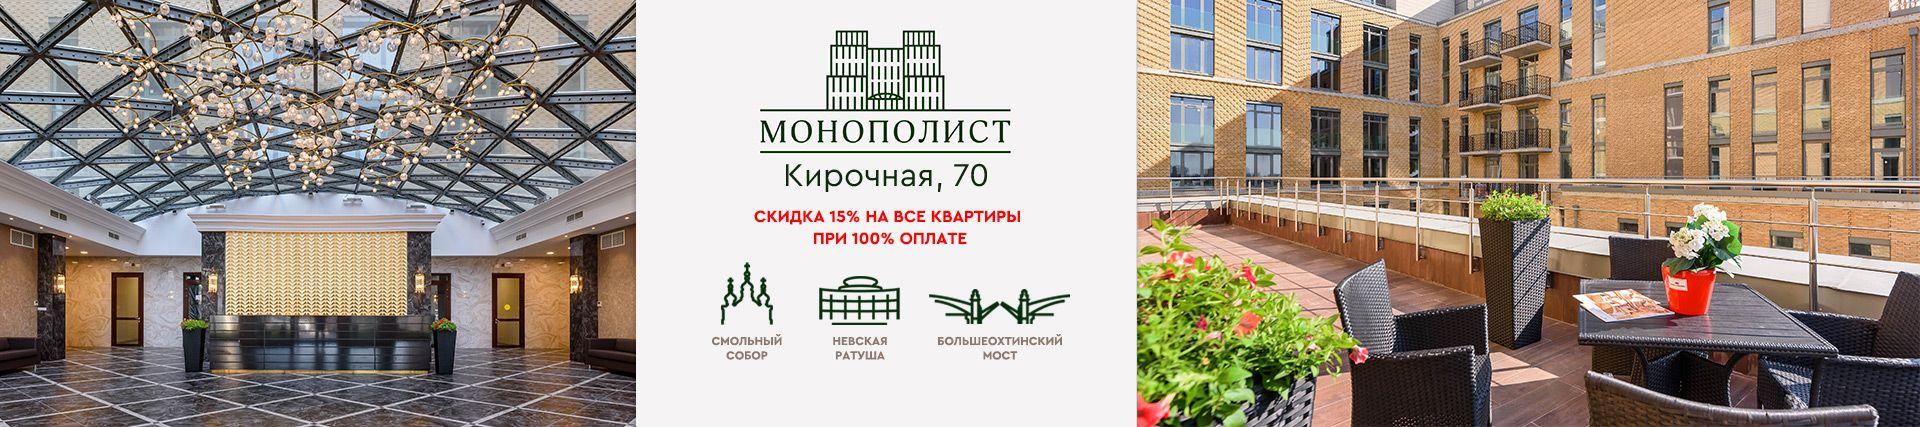 https://evspb.ru/wp-content/uploads/2019/09/top-pd-dm.jpg